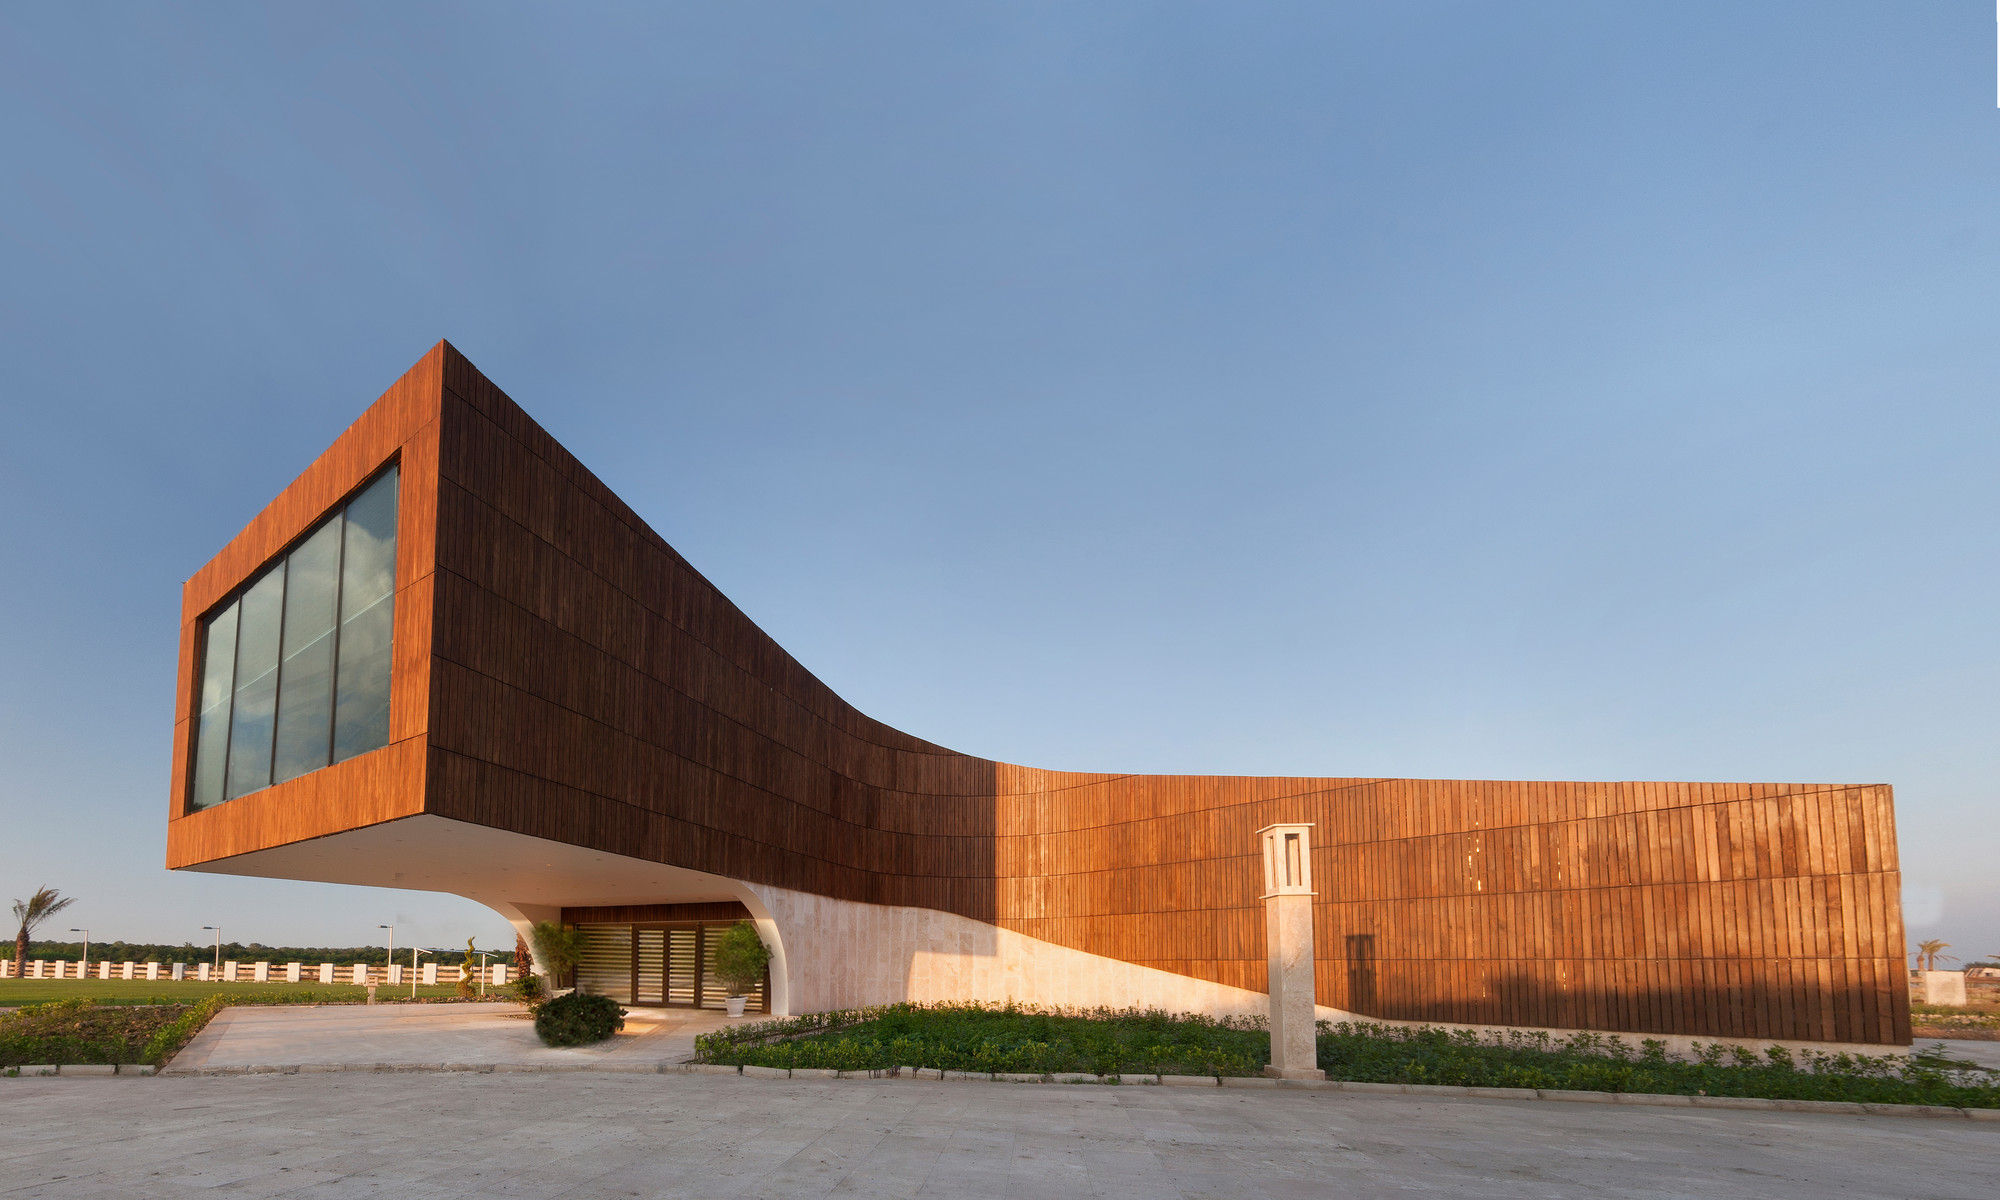 Dashte Noor's Gym Building / Narges Nassiri-Toosi, © Shahriyar Mazaheri